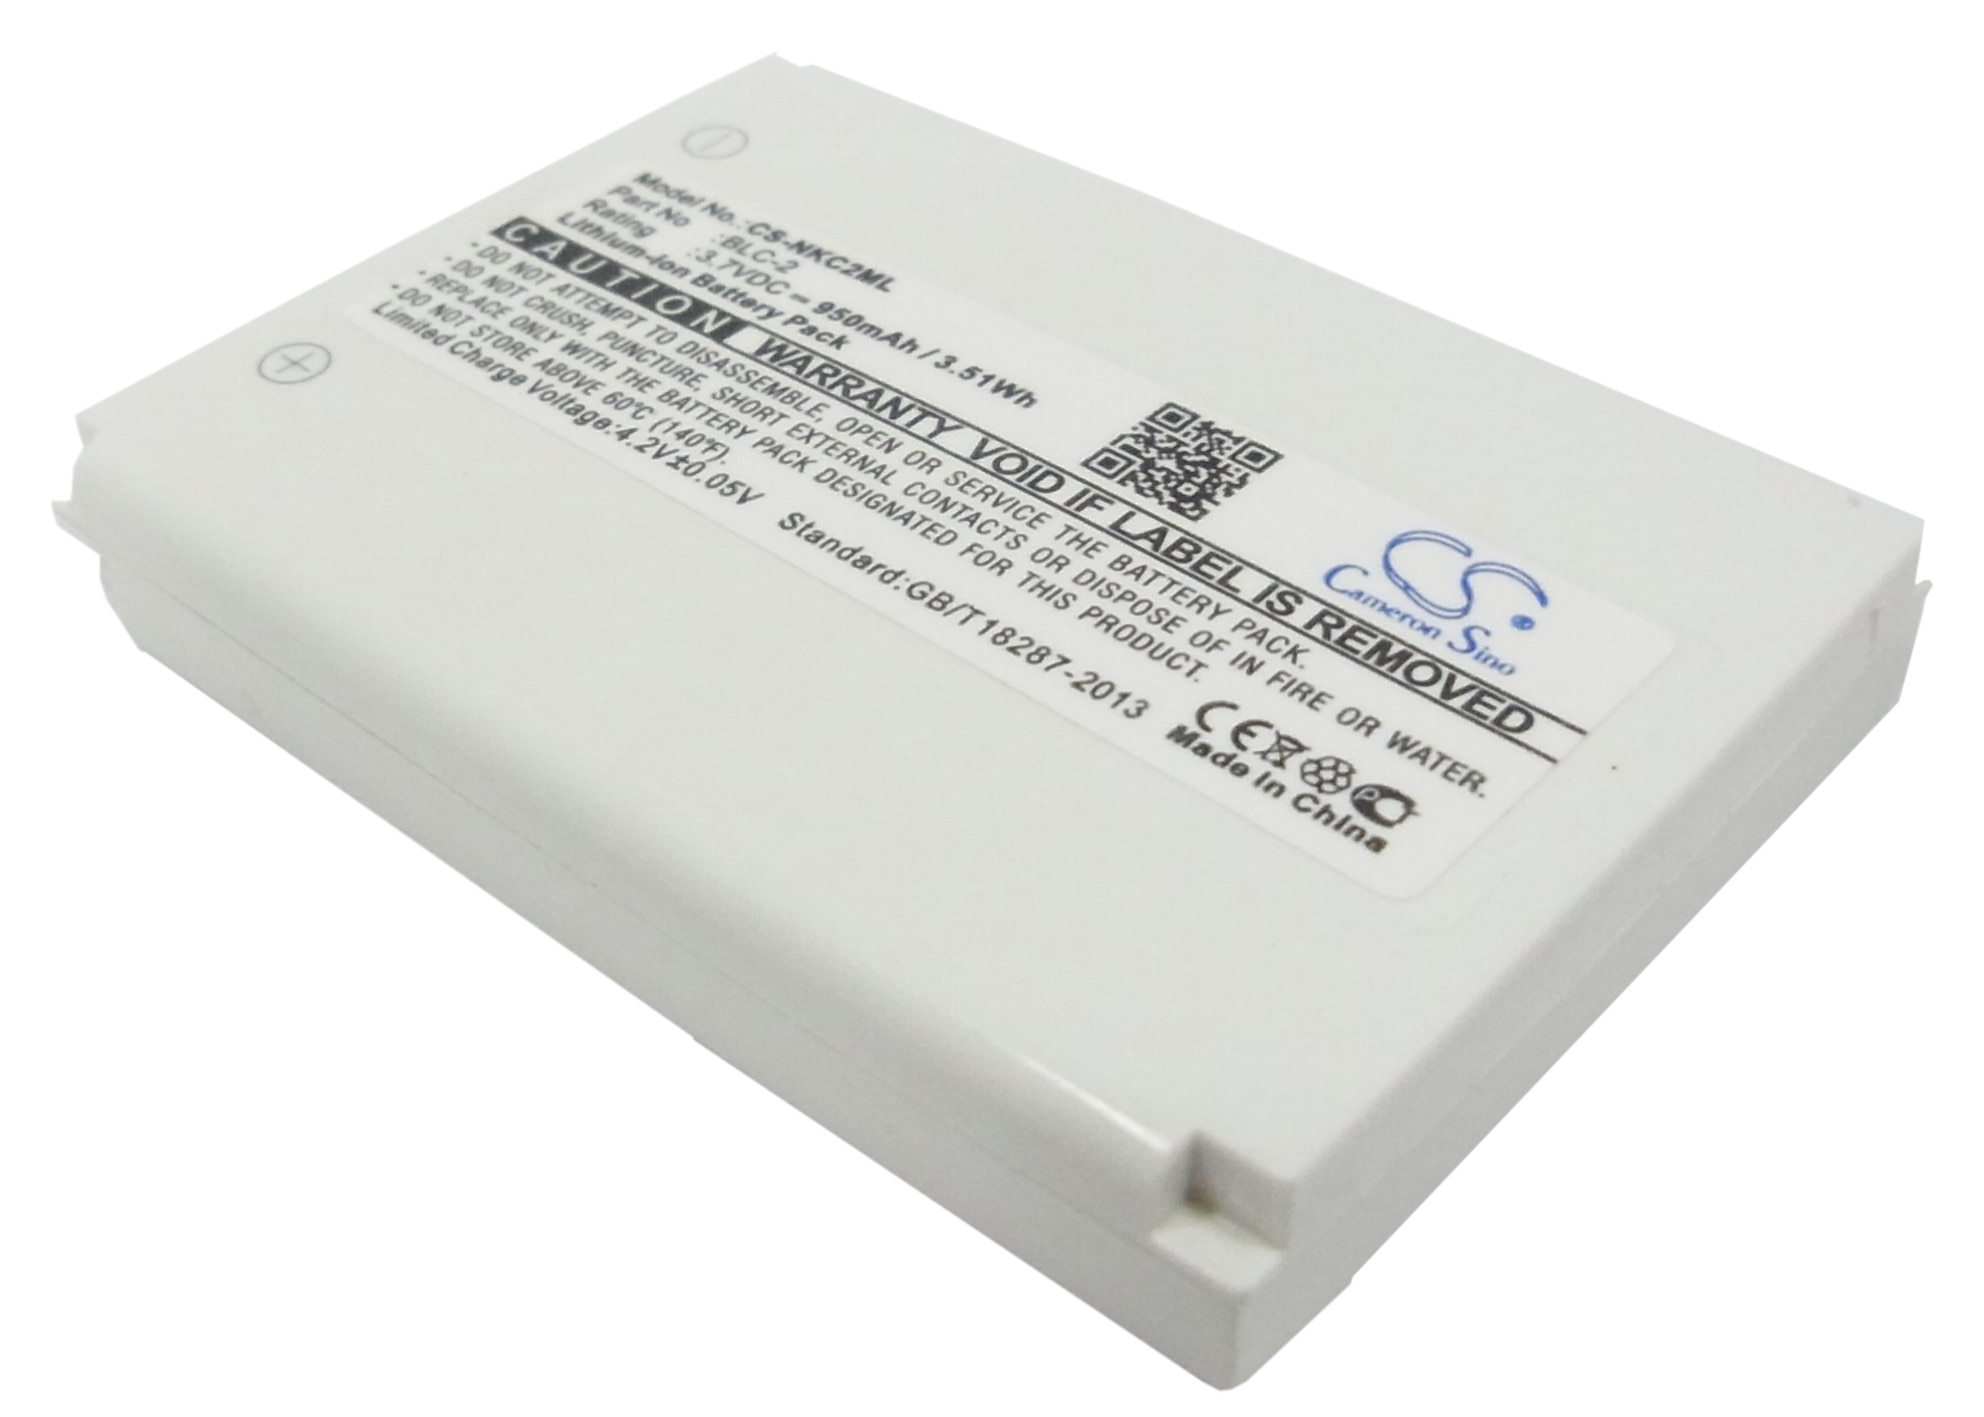 Cameron sino BLC-1, BLC-2, BMC-3 bateria para 1220, 1221, 1260, 1261, 2260, 3310, 3315, 3330, 3350, 3360, 3385